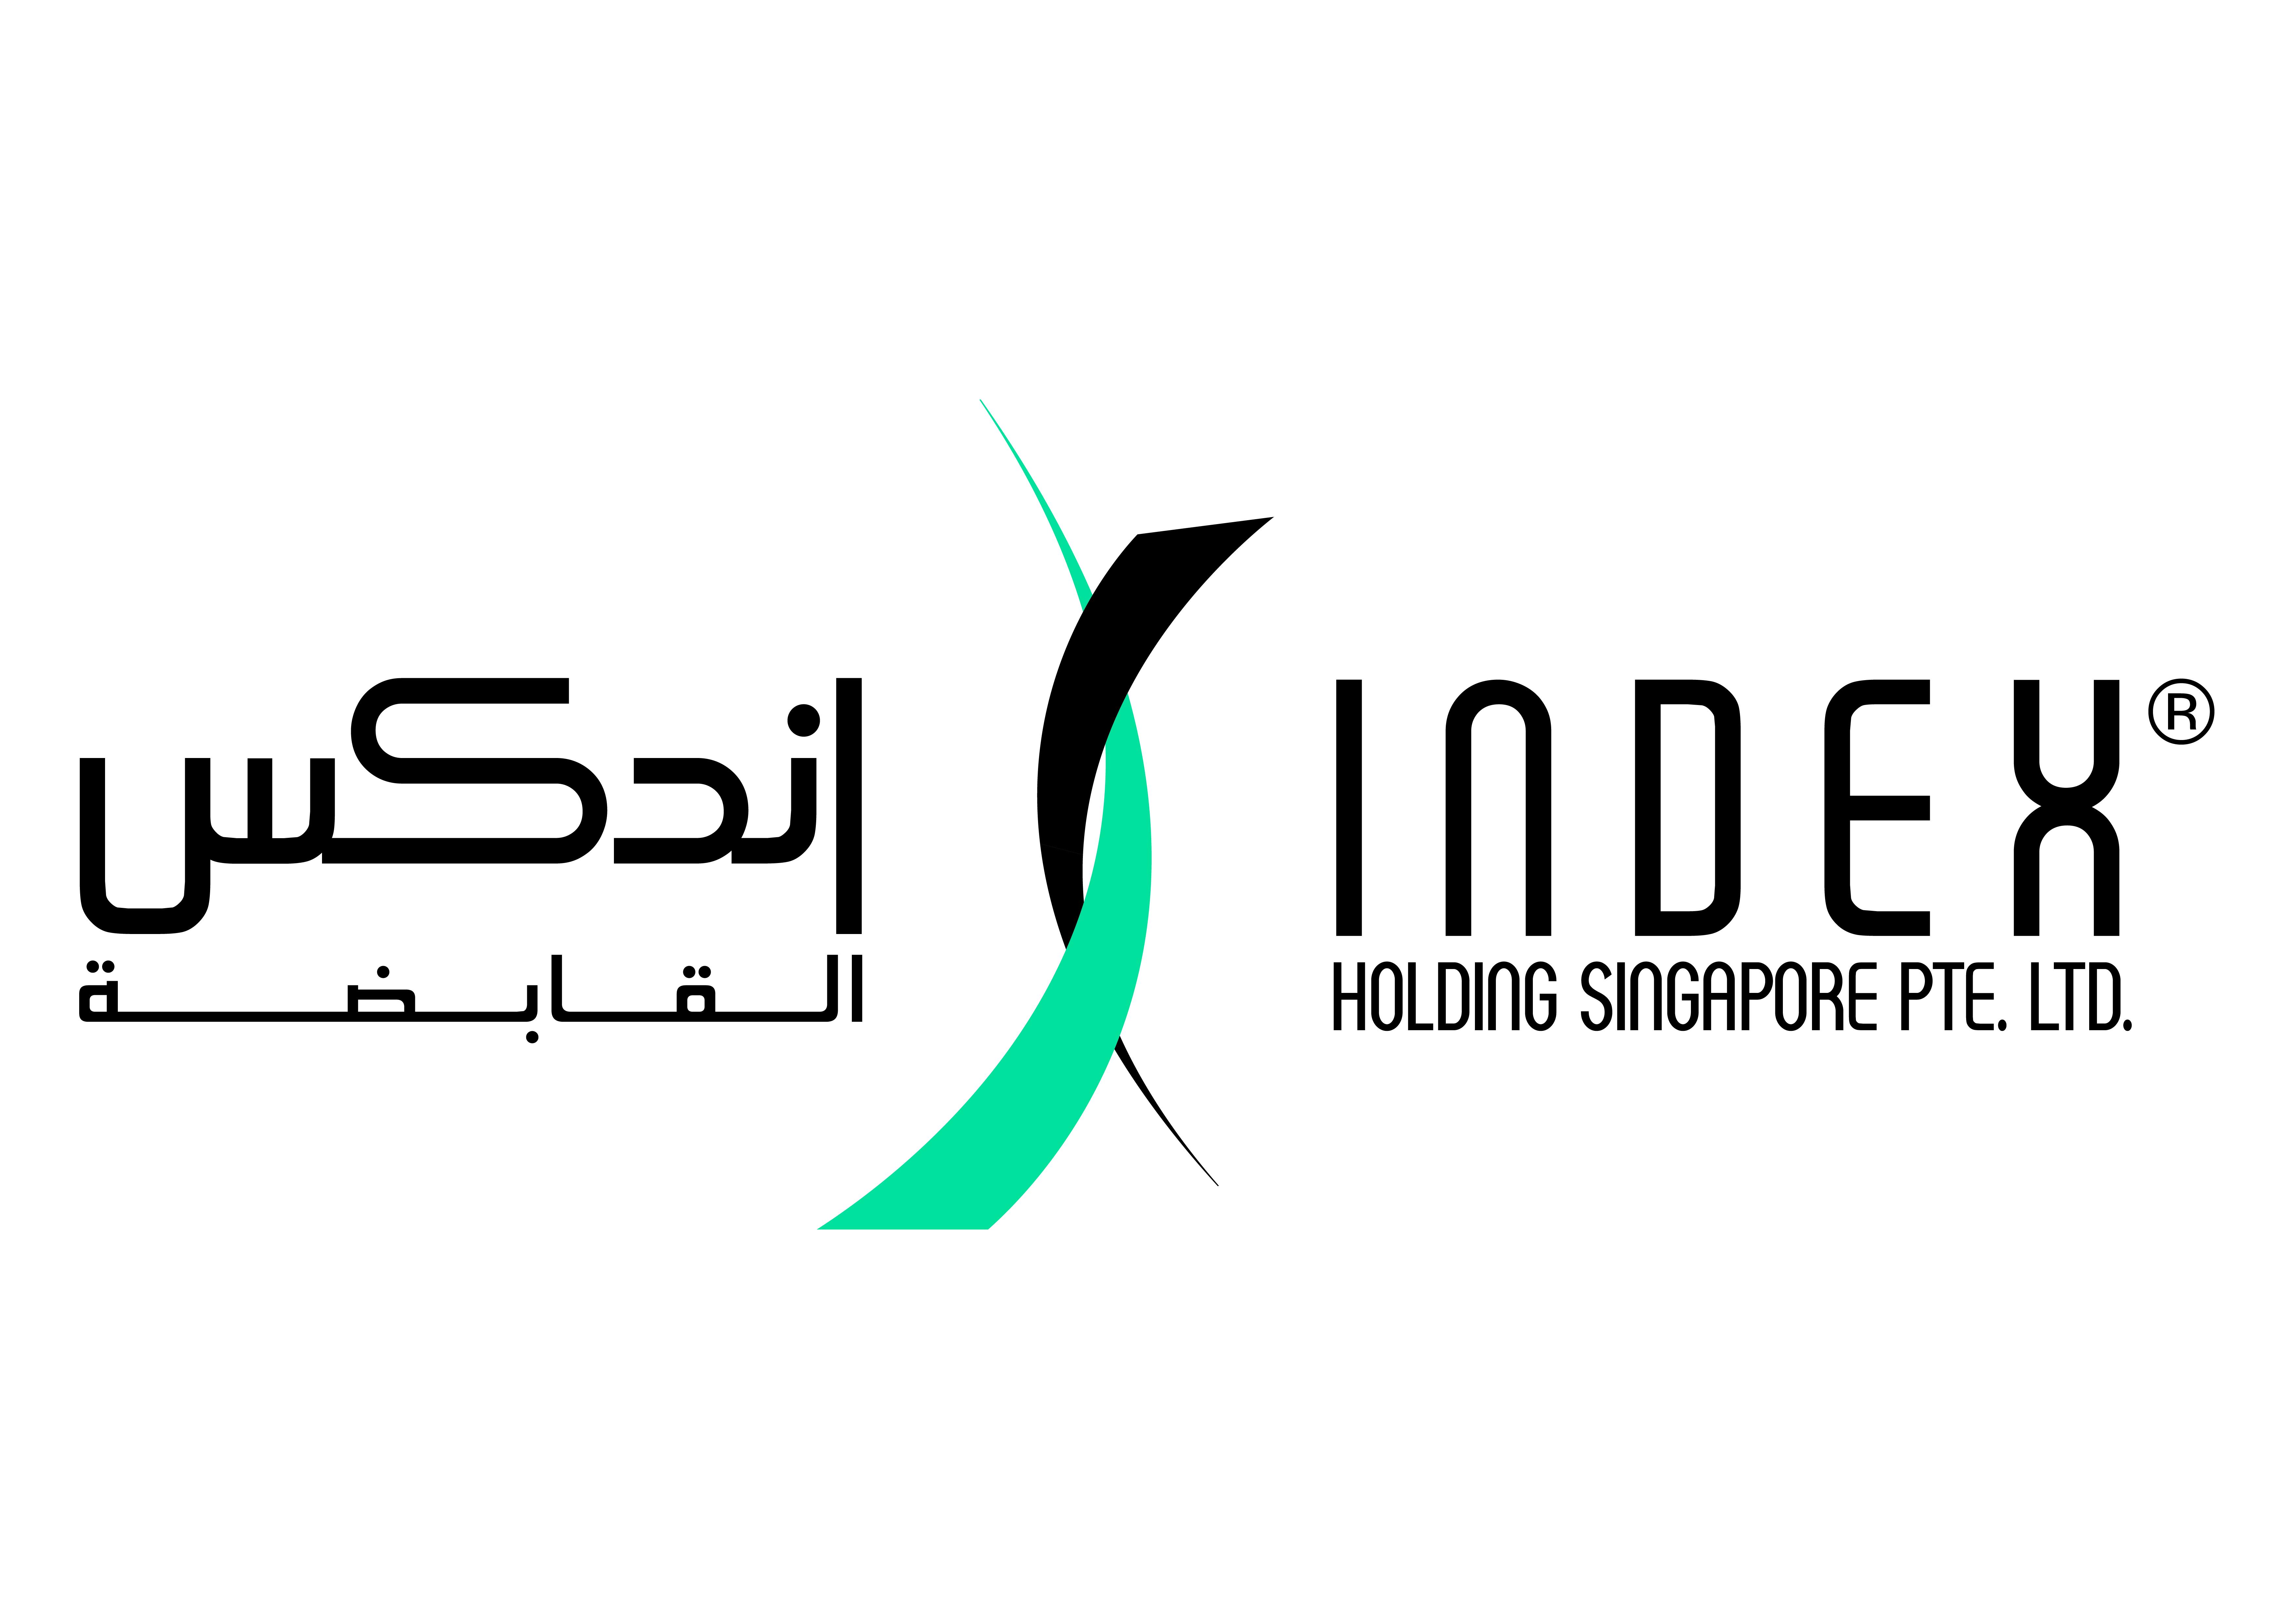 INDEX HOLDING Singapore Pte Ltd